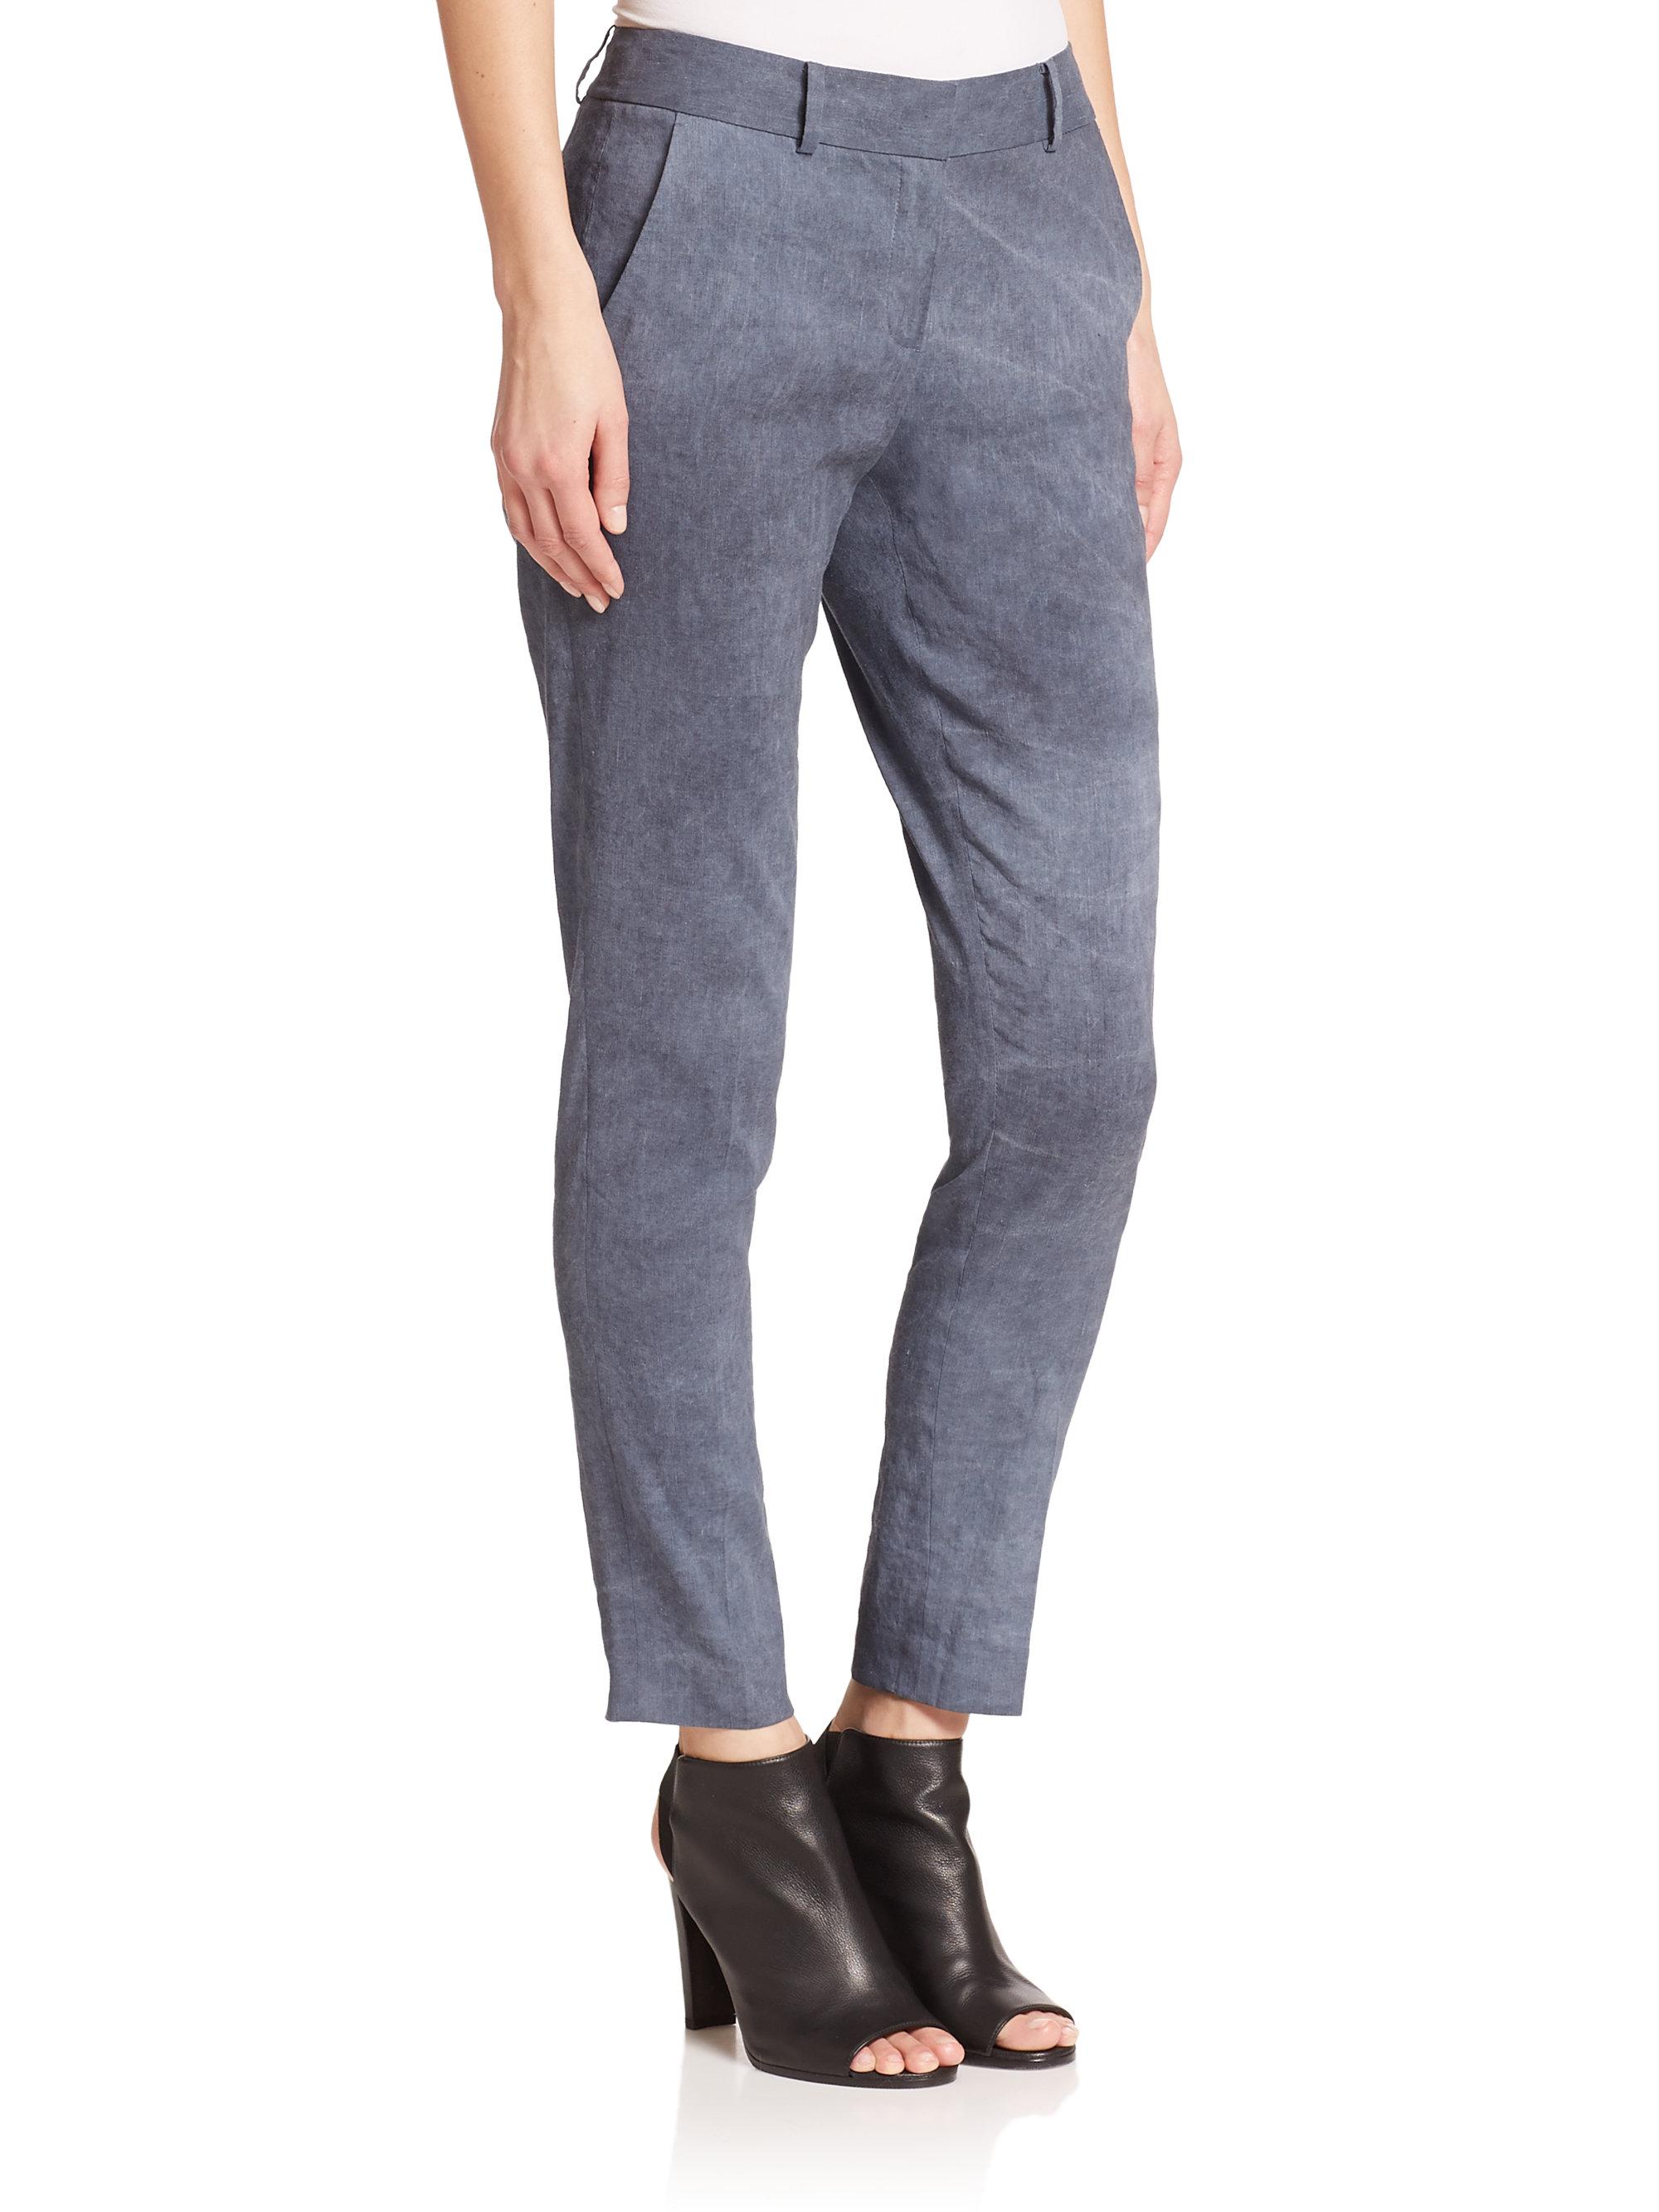 99871eb7c8d Lyst - Elie Tahari Alanis Pants in Gray